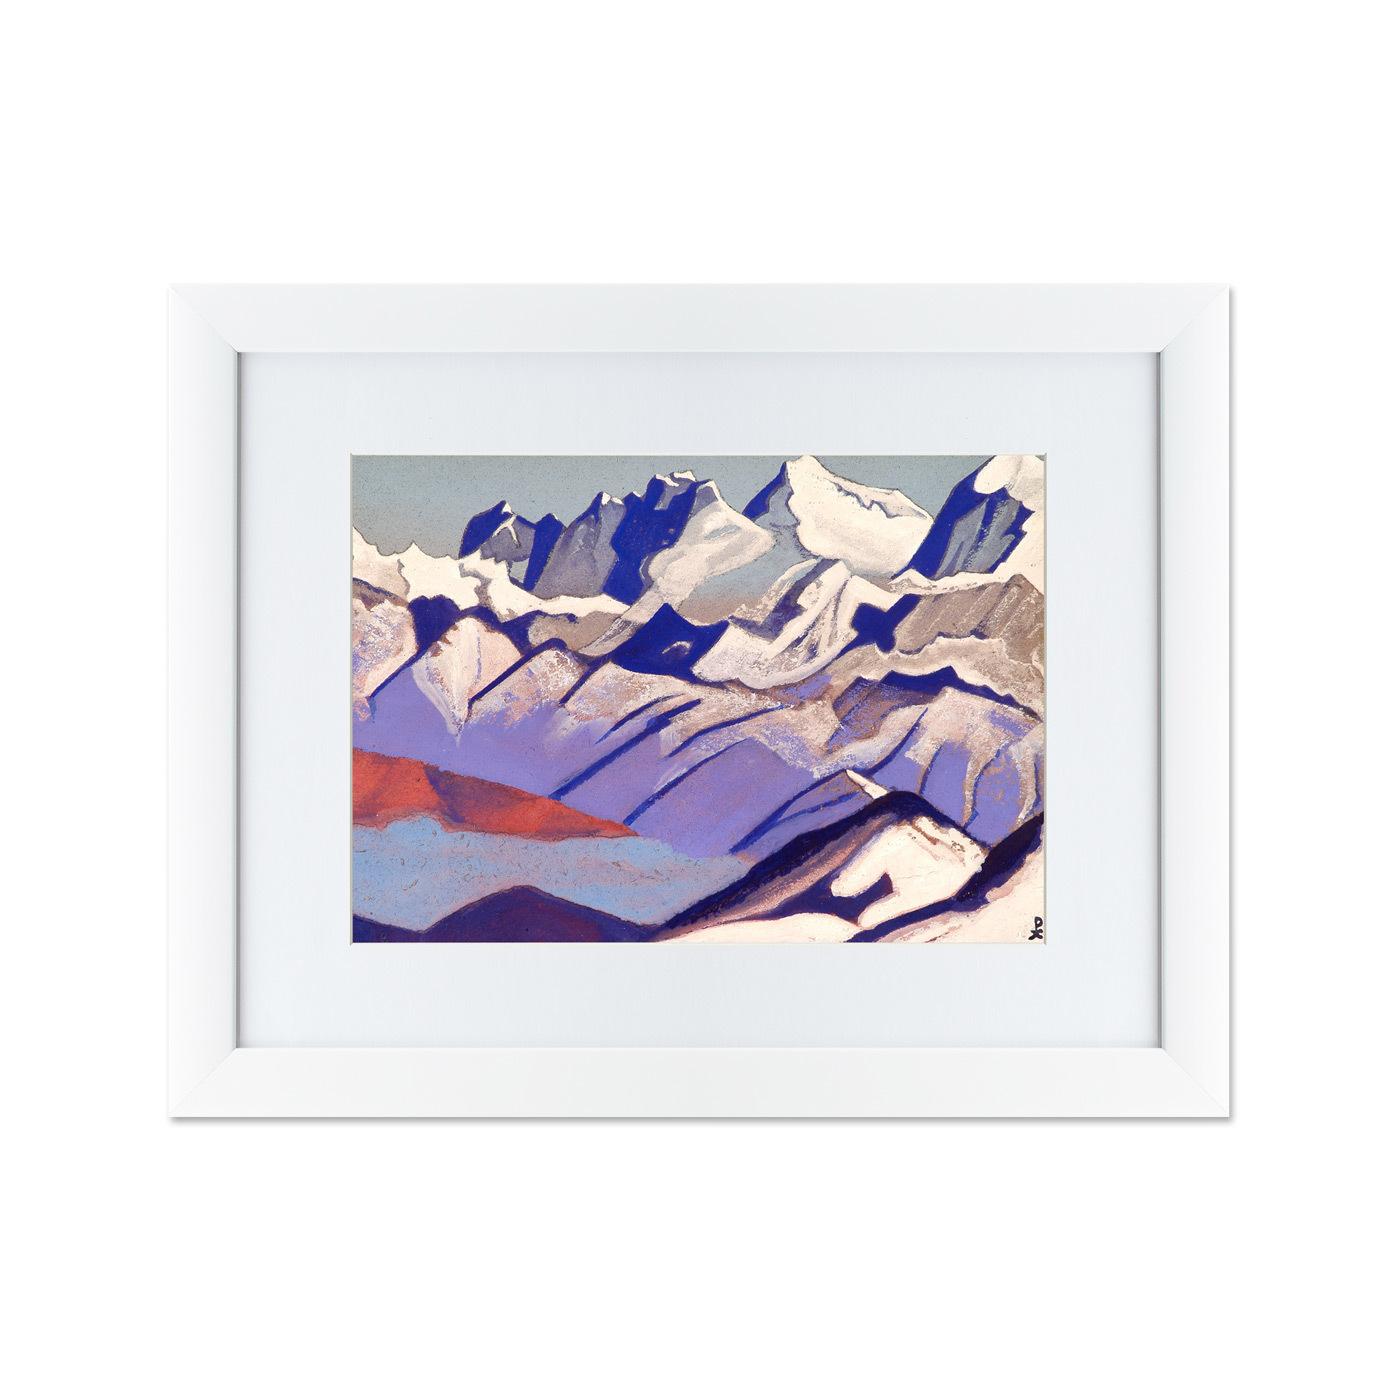 {} Картины в Квартиру Картина Эверест (47х60 см) картины в квартиру картина пилигрим из мешхеда 47х60 см